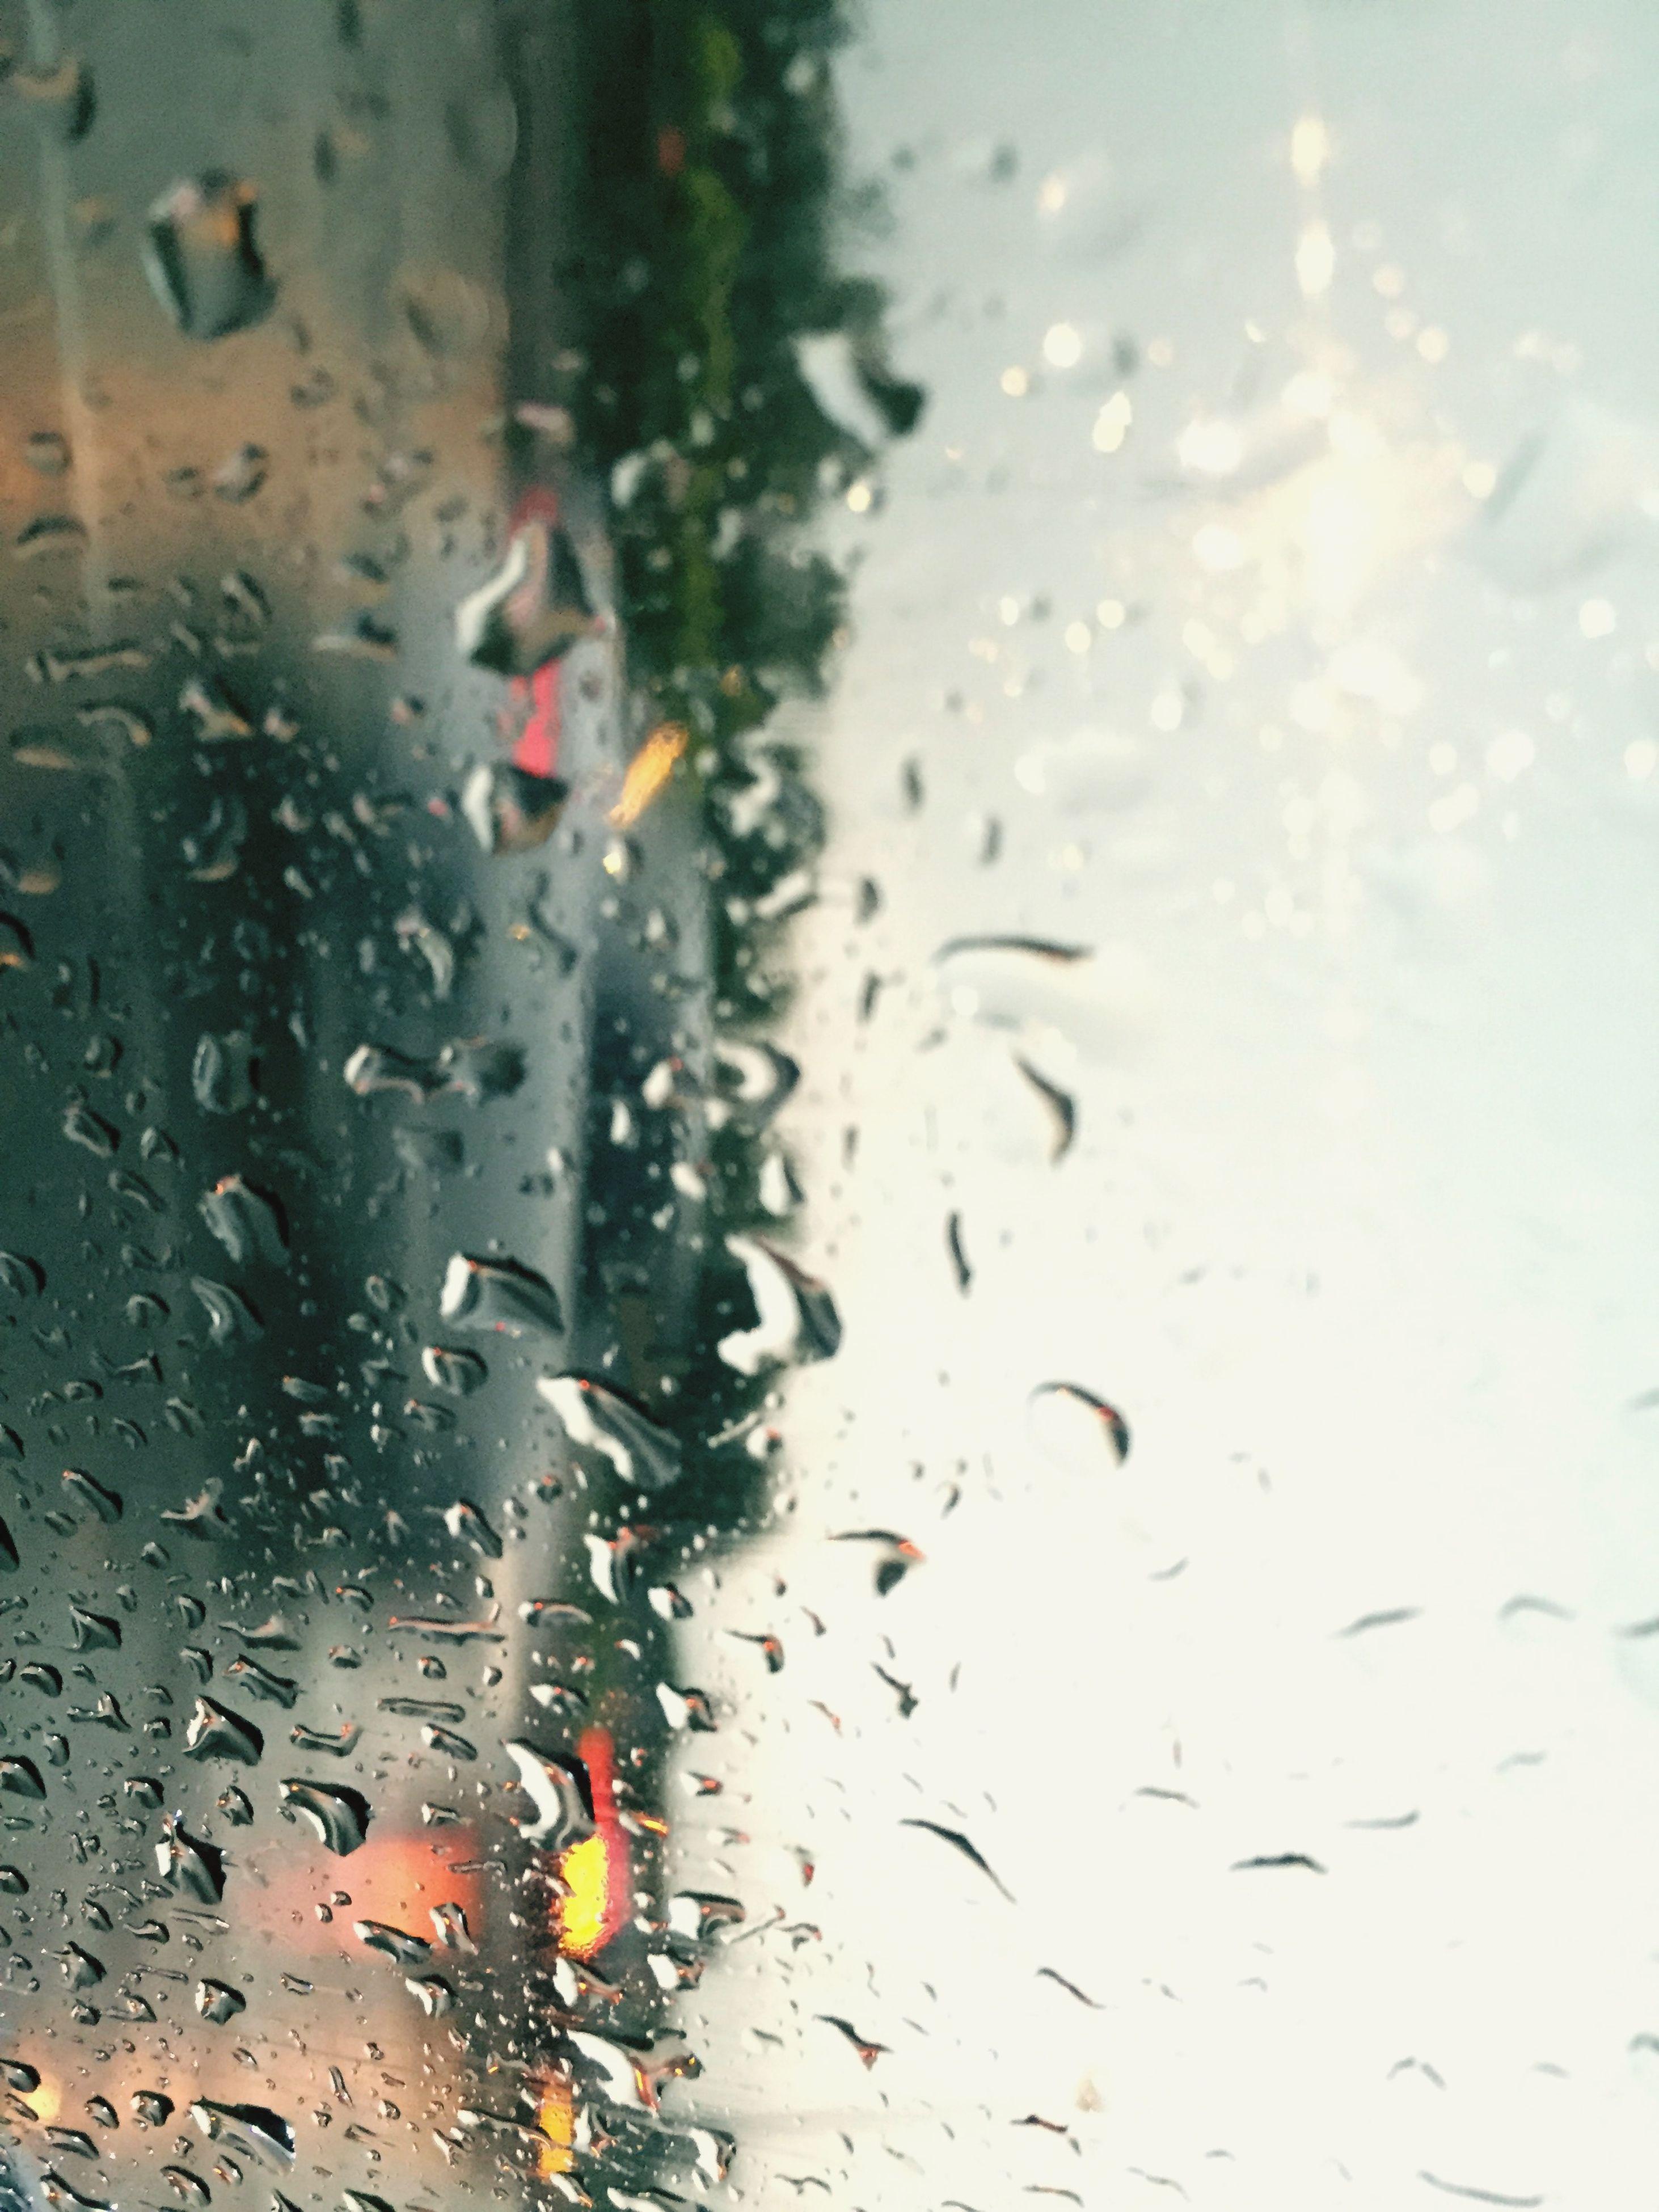 wet, drop, rain, water, window, weather, season, transparent, glass - material, transportation, raindrop, car, monsoon, mode of transport, land vehicle, street, indoors, sky, road, glass